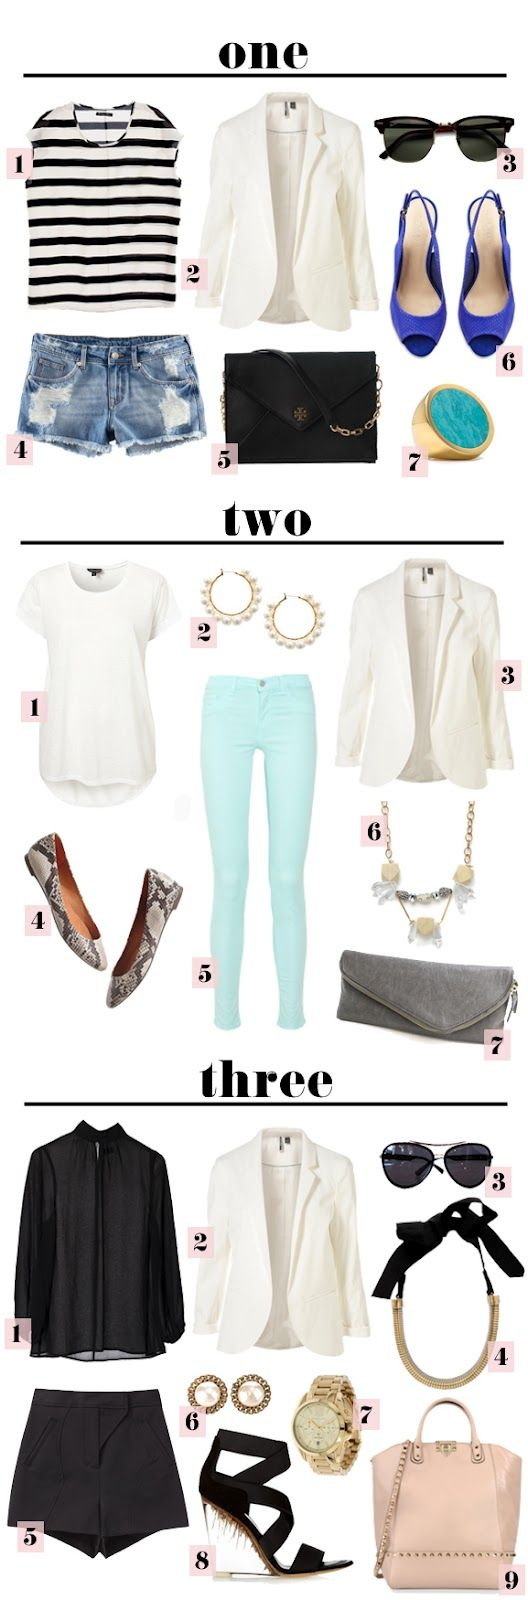 The Vault Files: Blog Series: 1x3 Ways: Light Pink Blazers, Fashion Sen, 1X3 Beautiful, Brunch Outfits, Beautiful Dresses, White Blazers Outfits, Blazers 3, Blog Series, Vaulted File